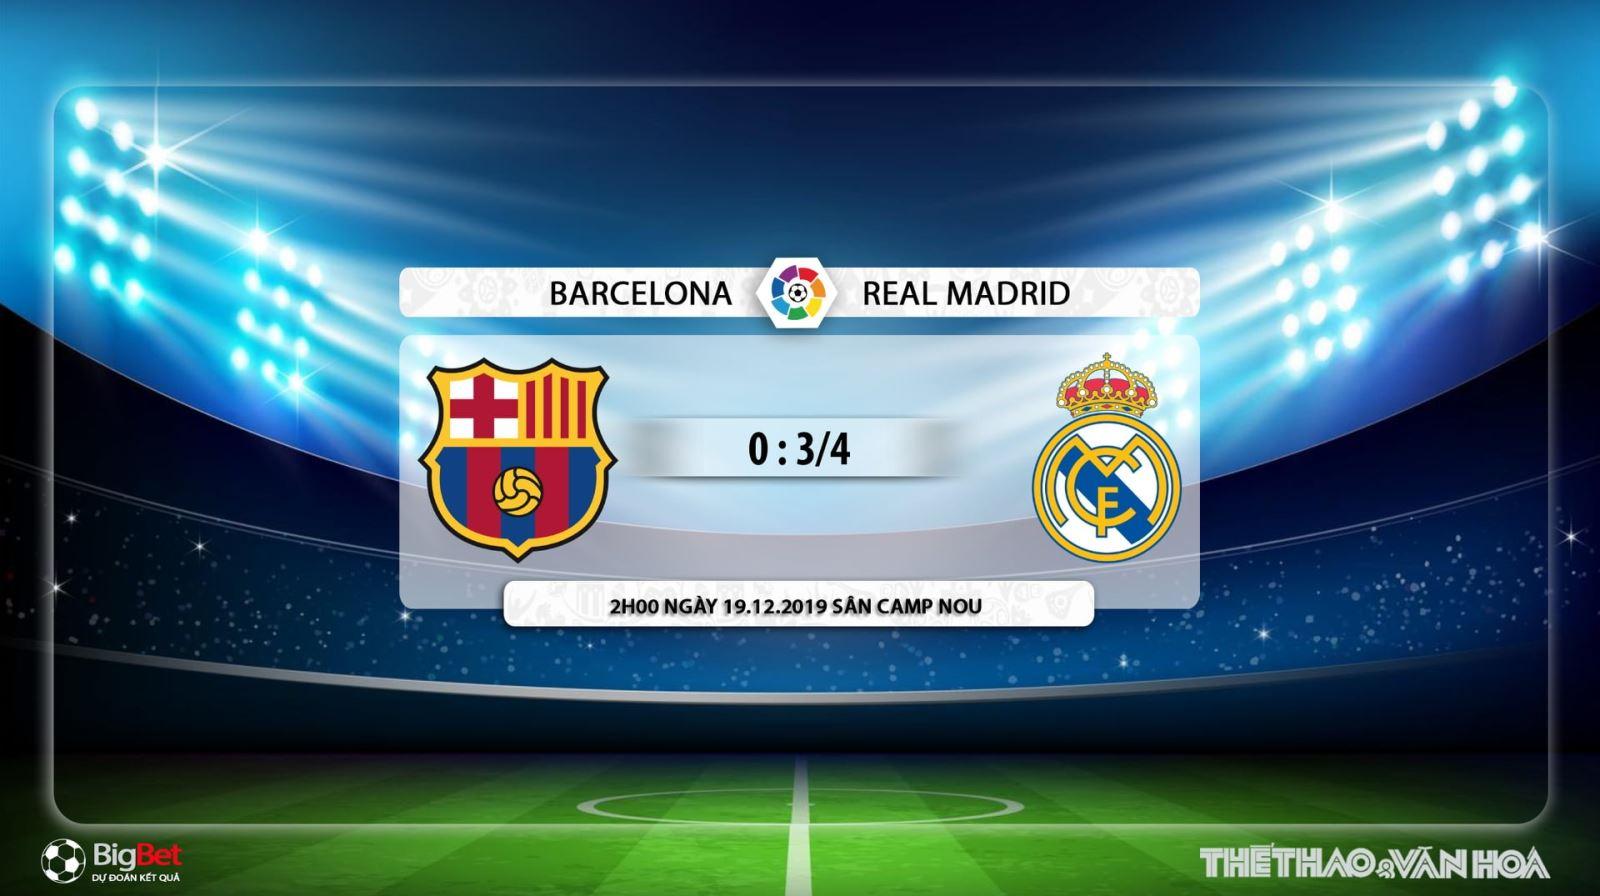 Barcelona vs Real Madrid, real madrid, barcelona, kèo real madrid vs barcelona, trực tiếp bóng đá, trực tiếp real madrid vs barcelona